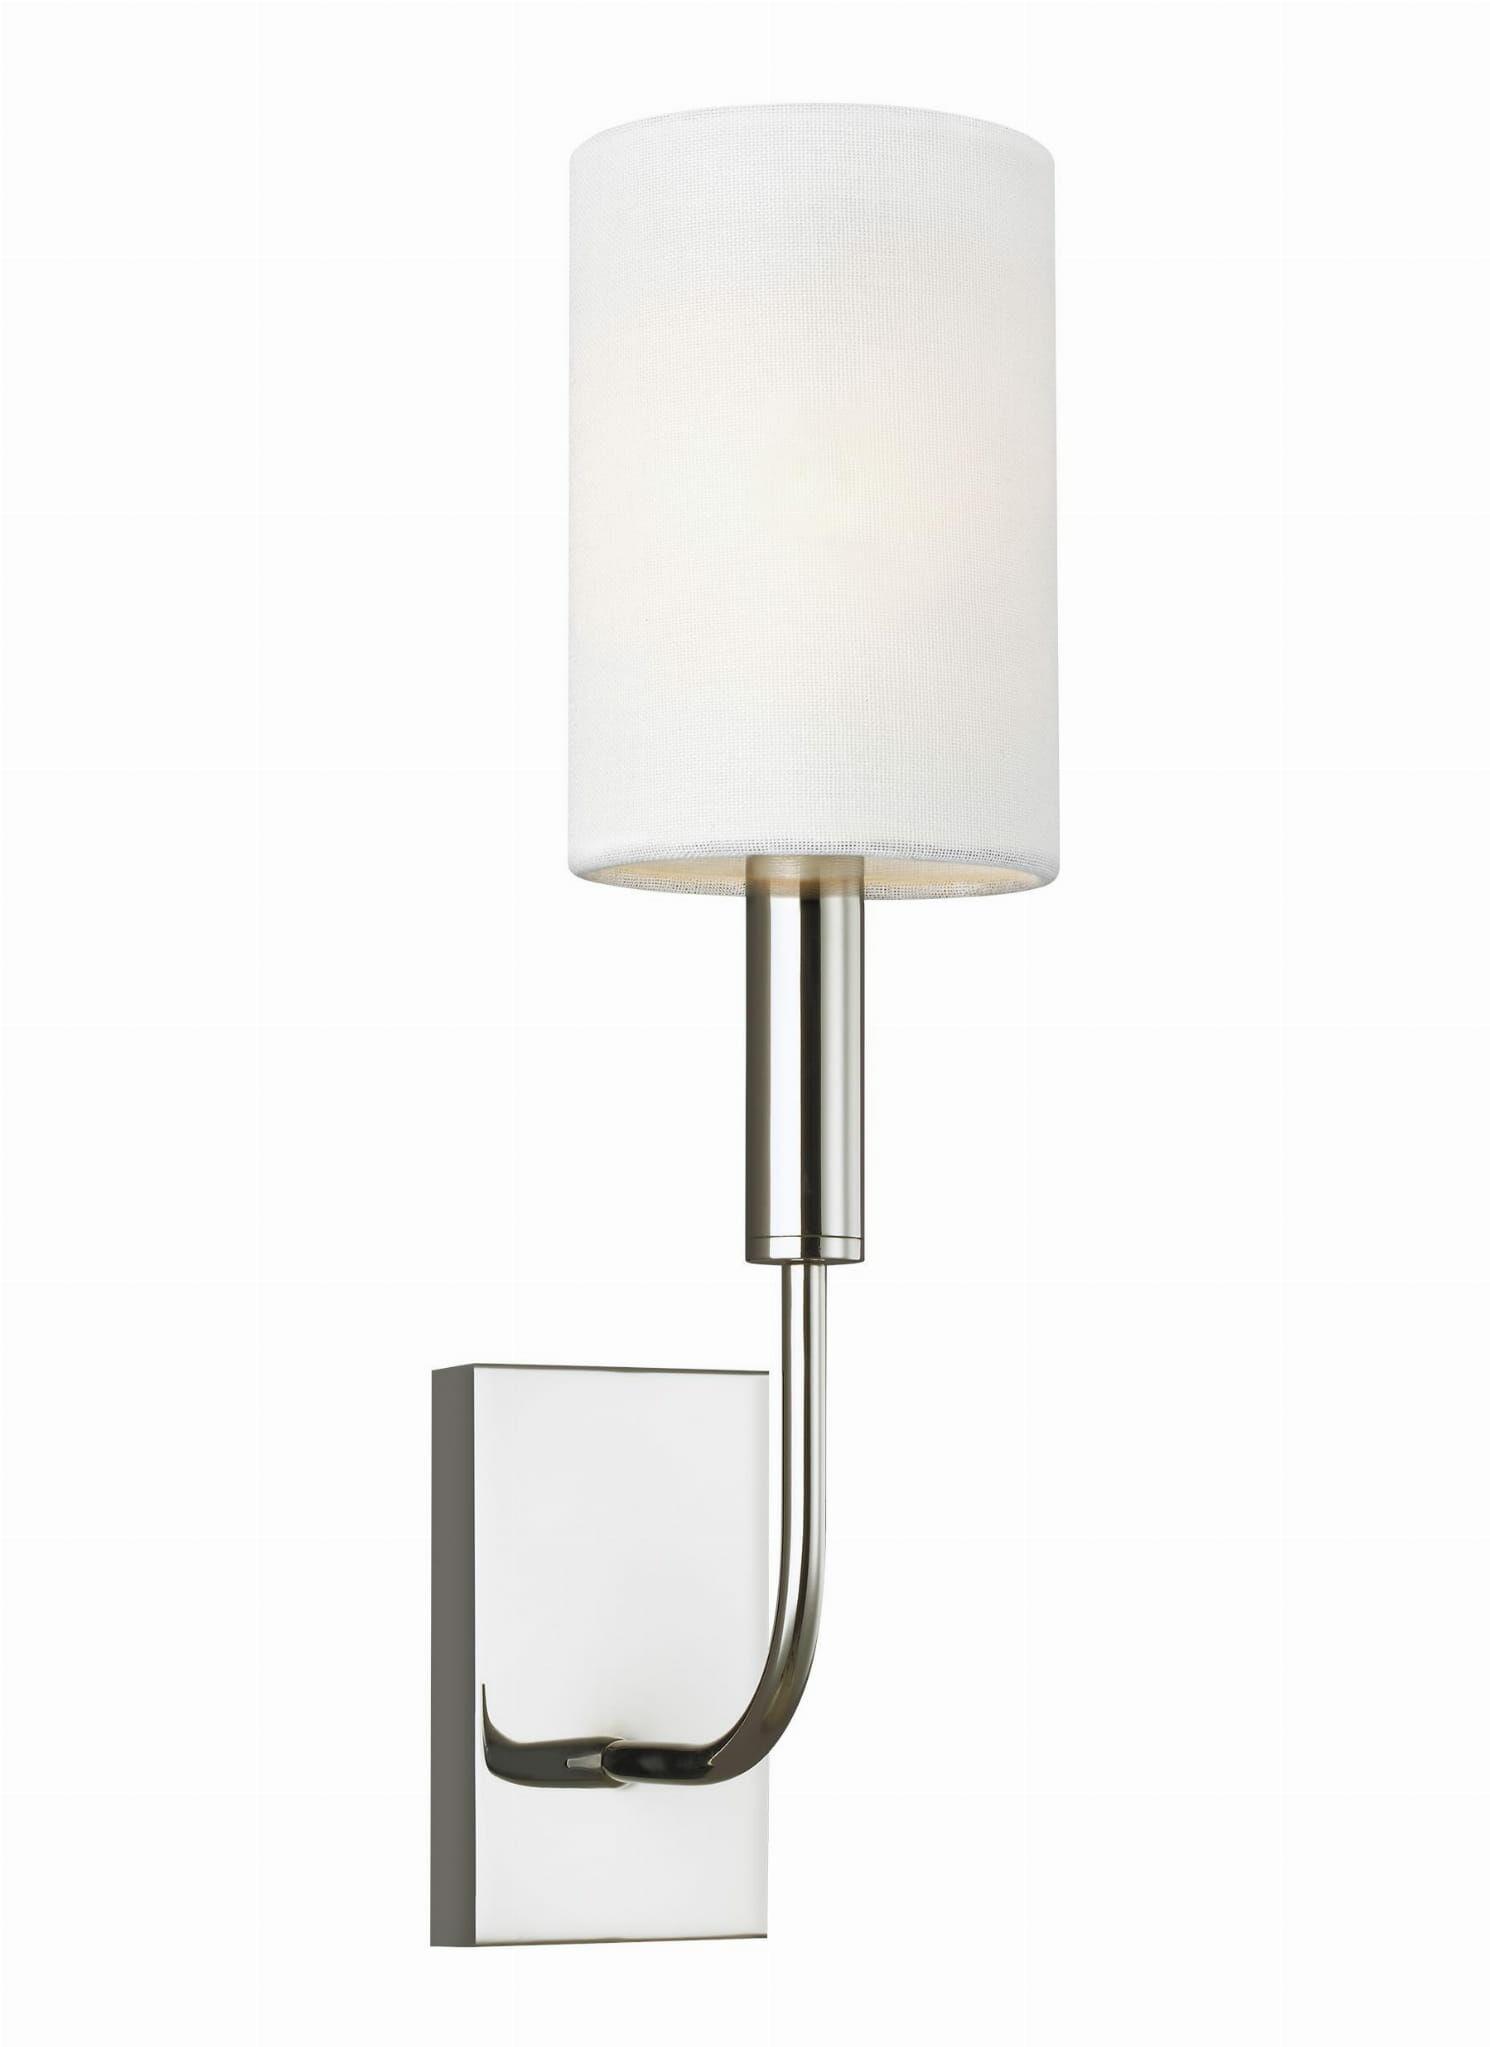 Kinkiet BRIANNA FE-BRIANNA1-PN - Elstead Lighting